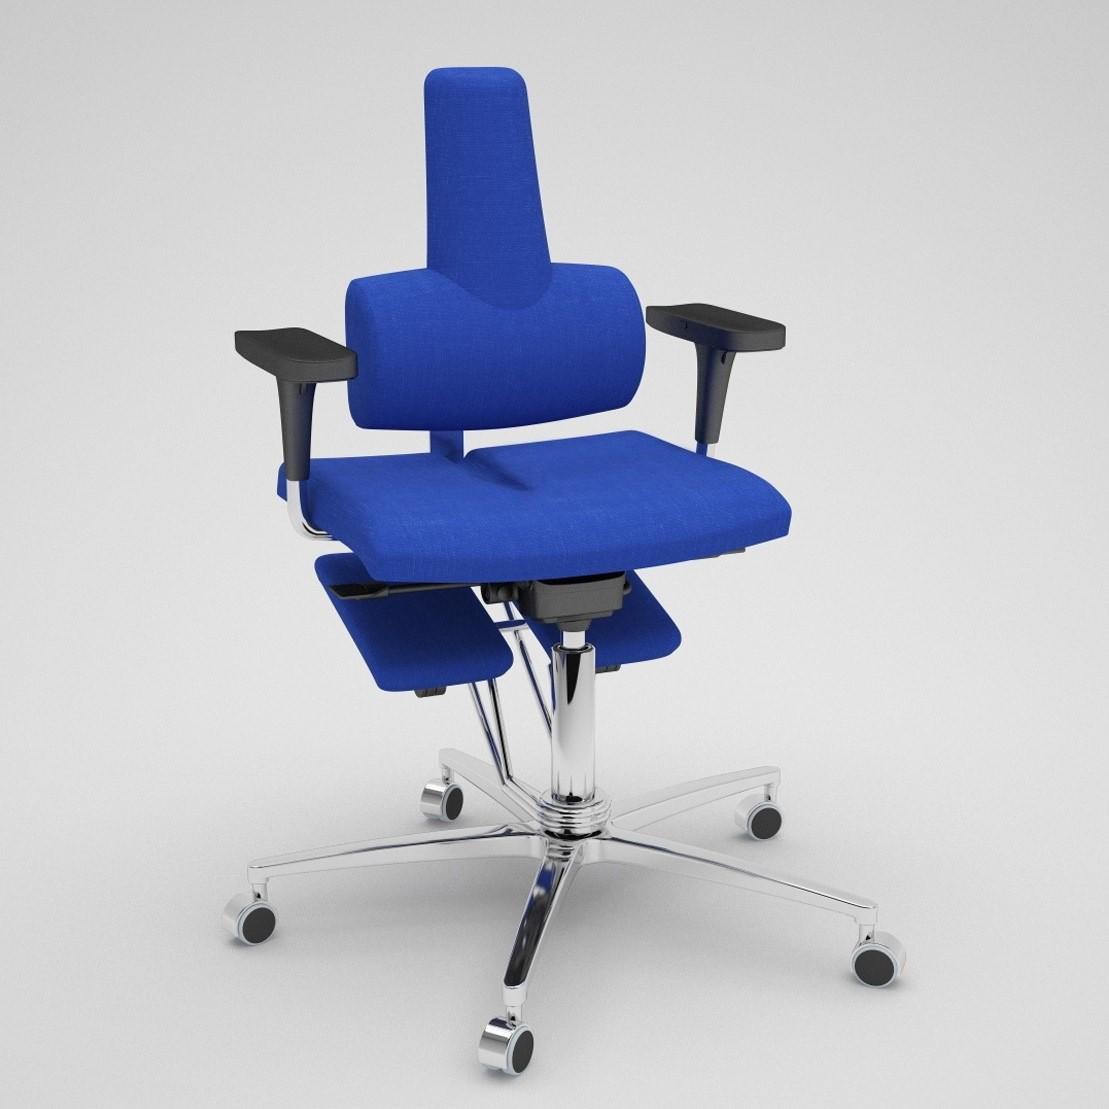 Sedia komfort spine with sedia ergonomica for Poltrone stokke